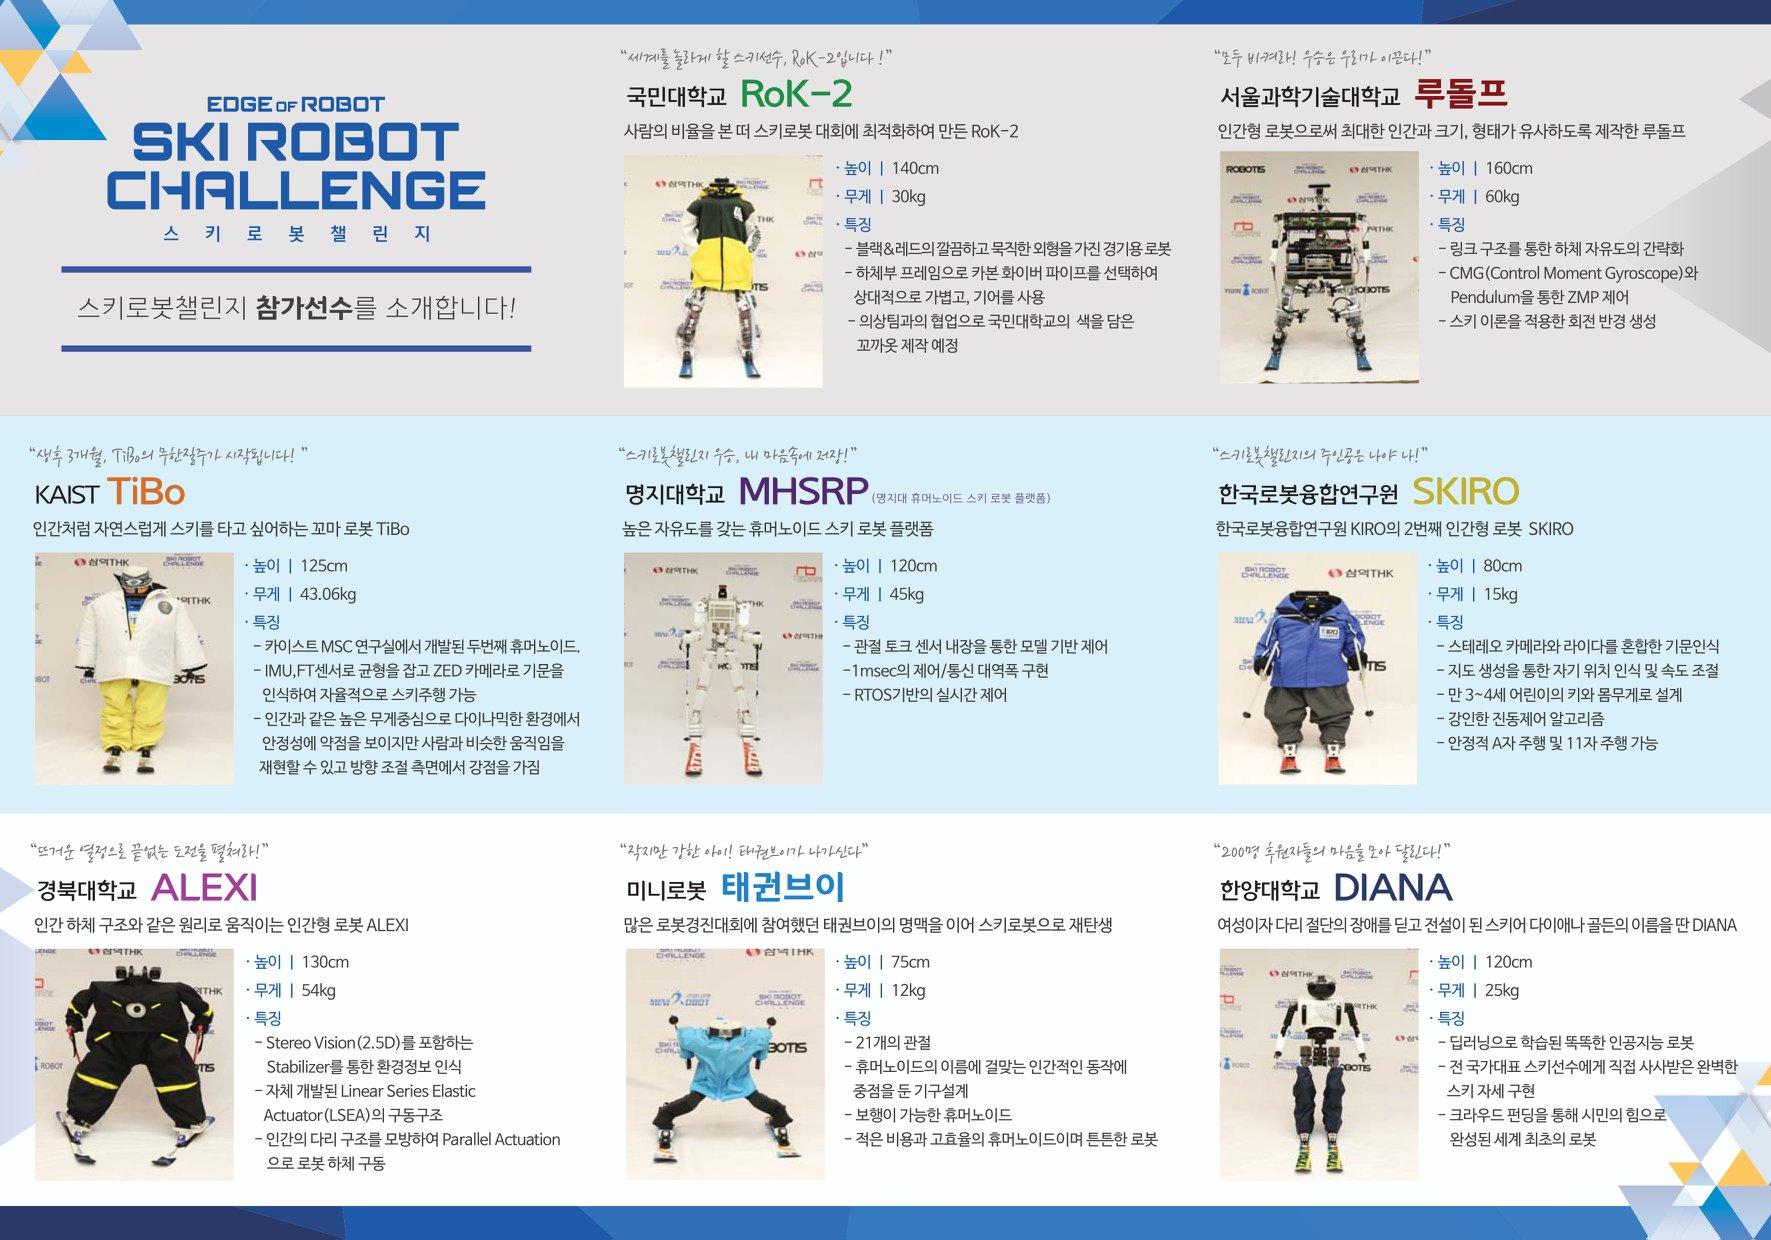 Winter olympics Robot Challenge